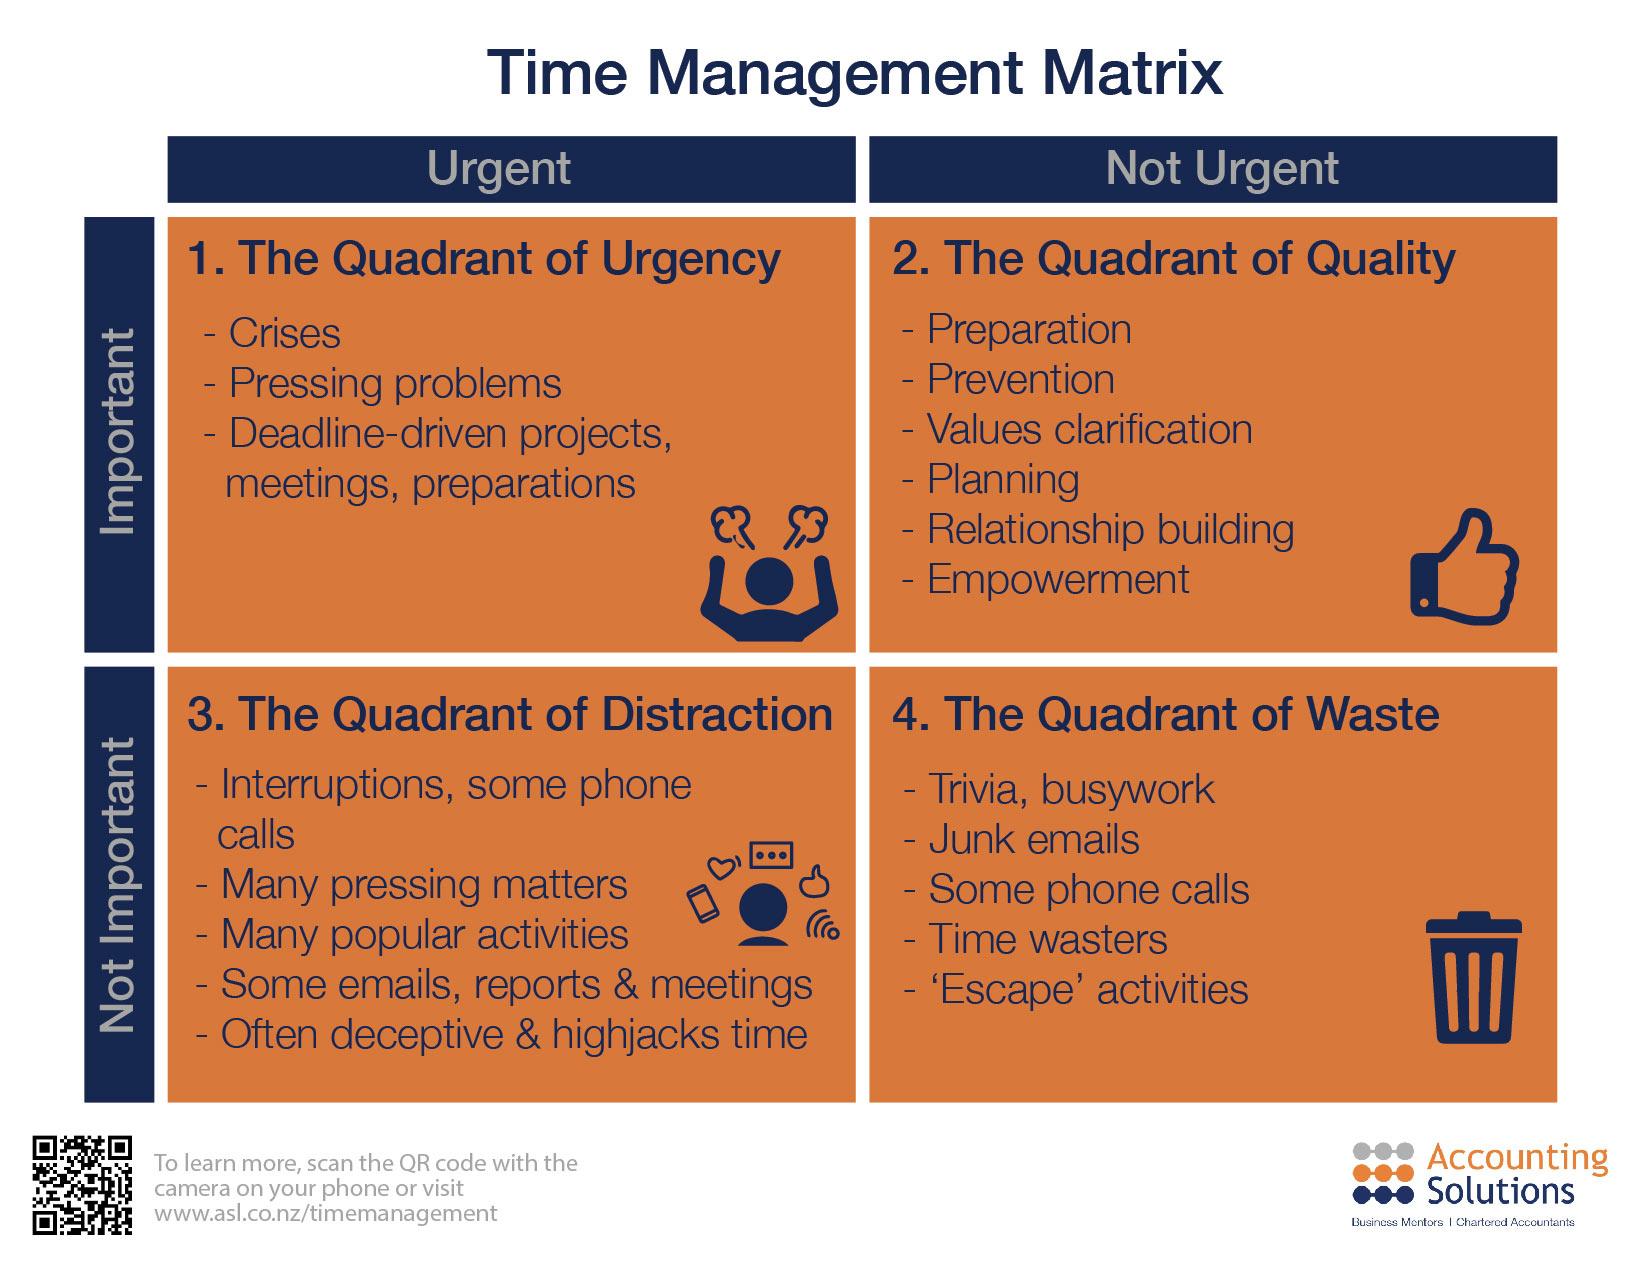 Time Management Matrix Infographic